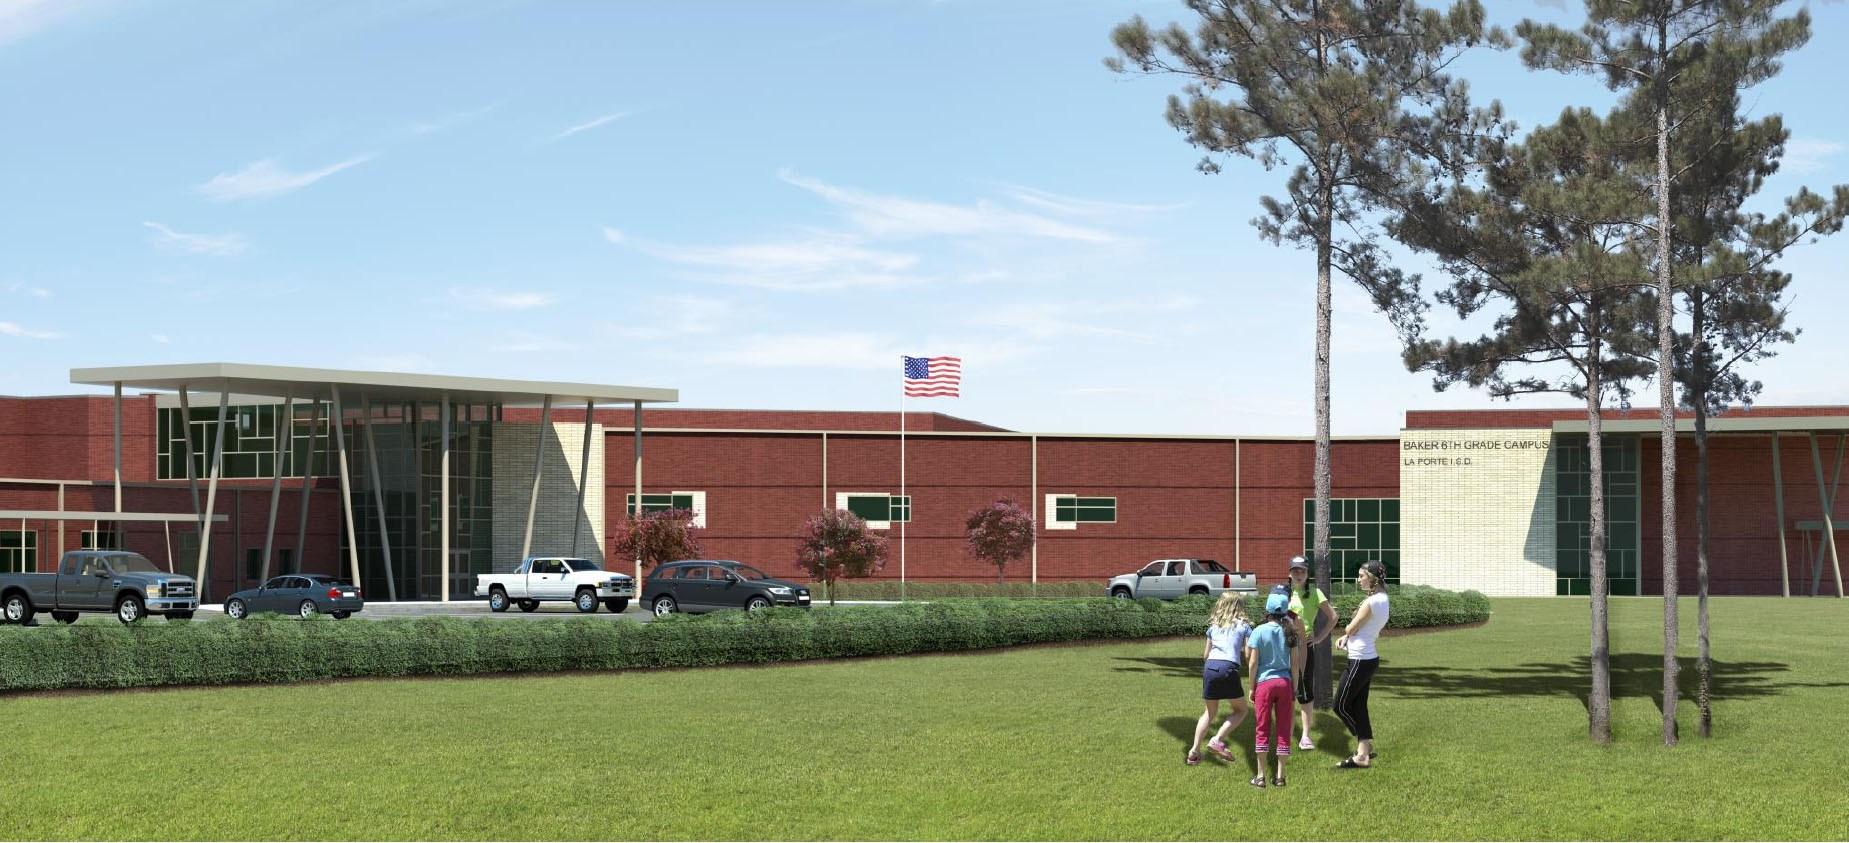 James h baker sixth grade campus 2014 bond program la for La porte independent school district